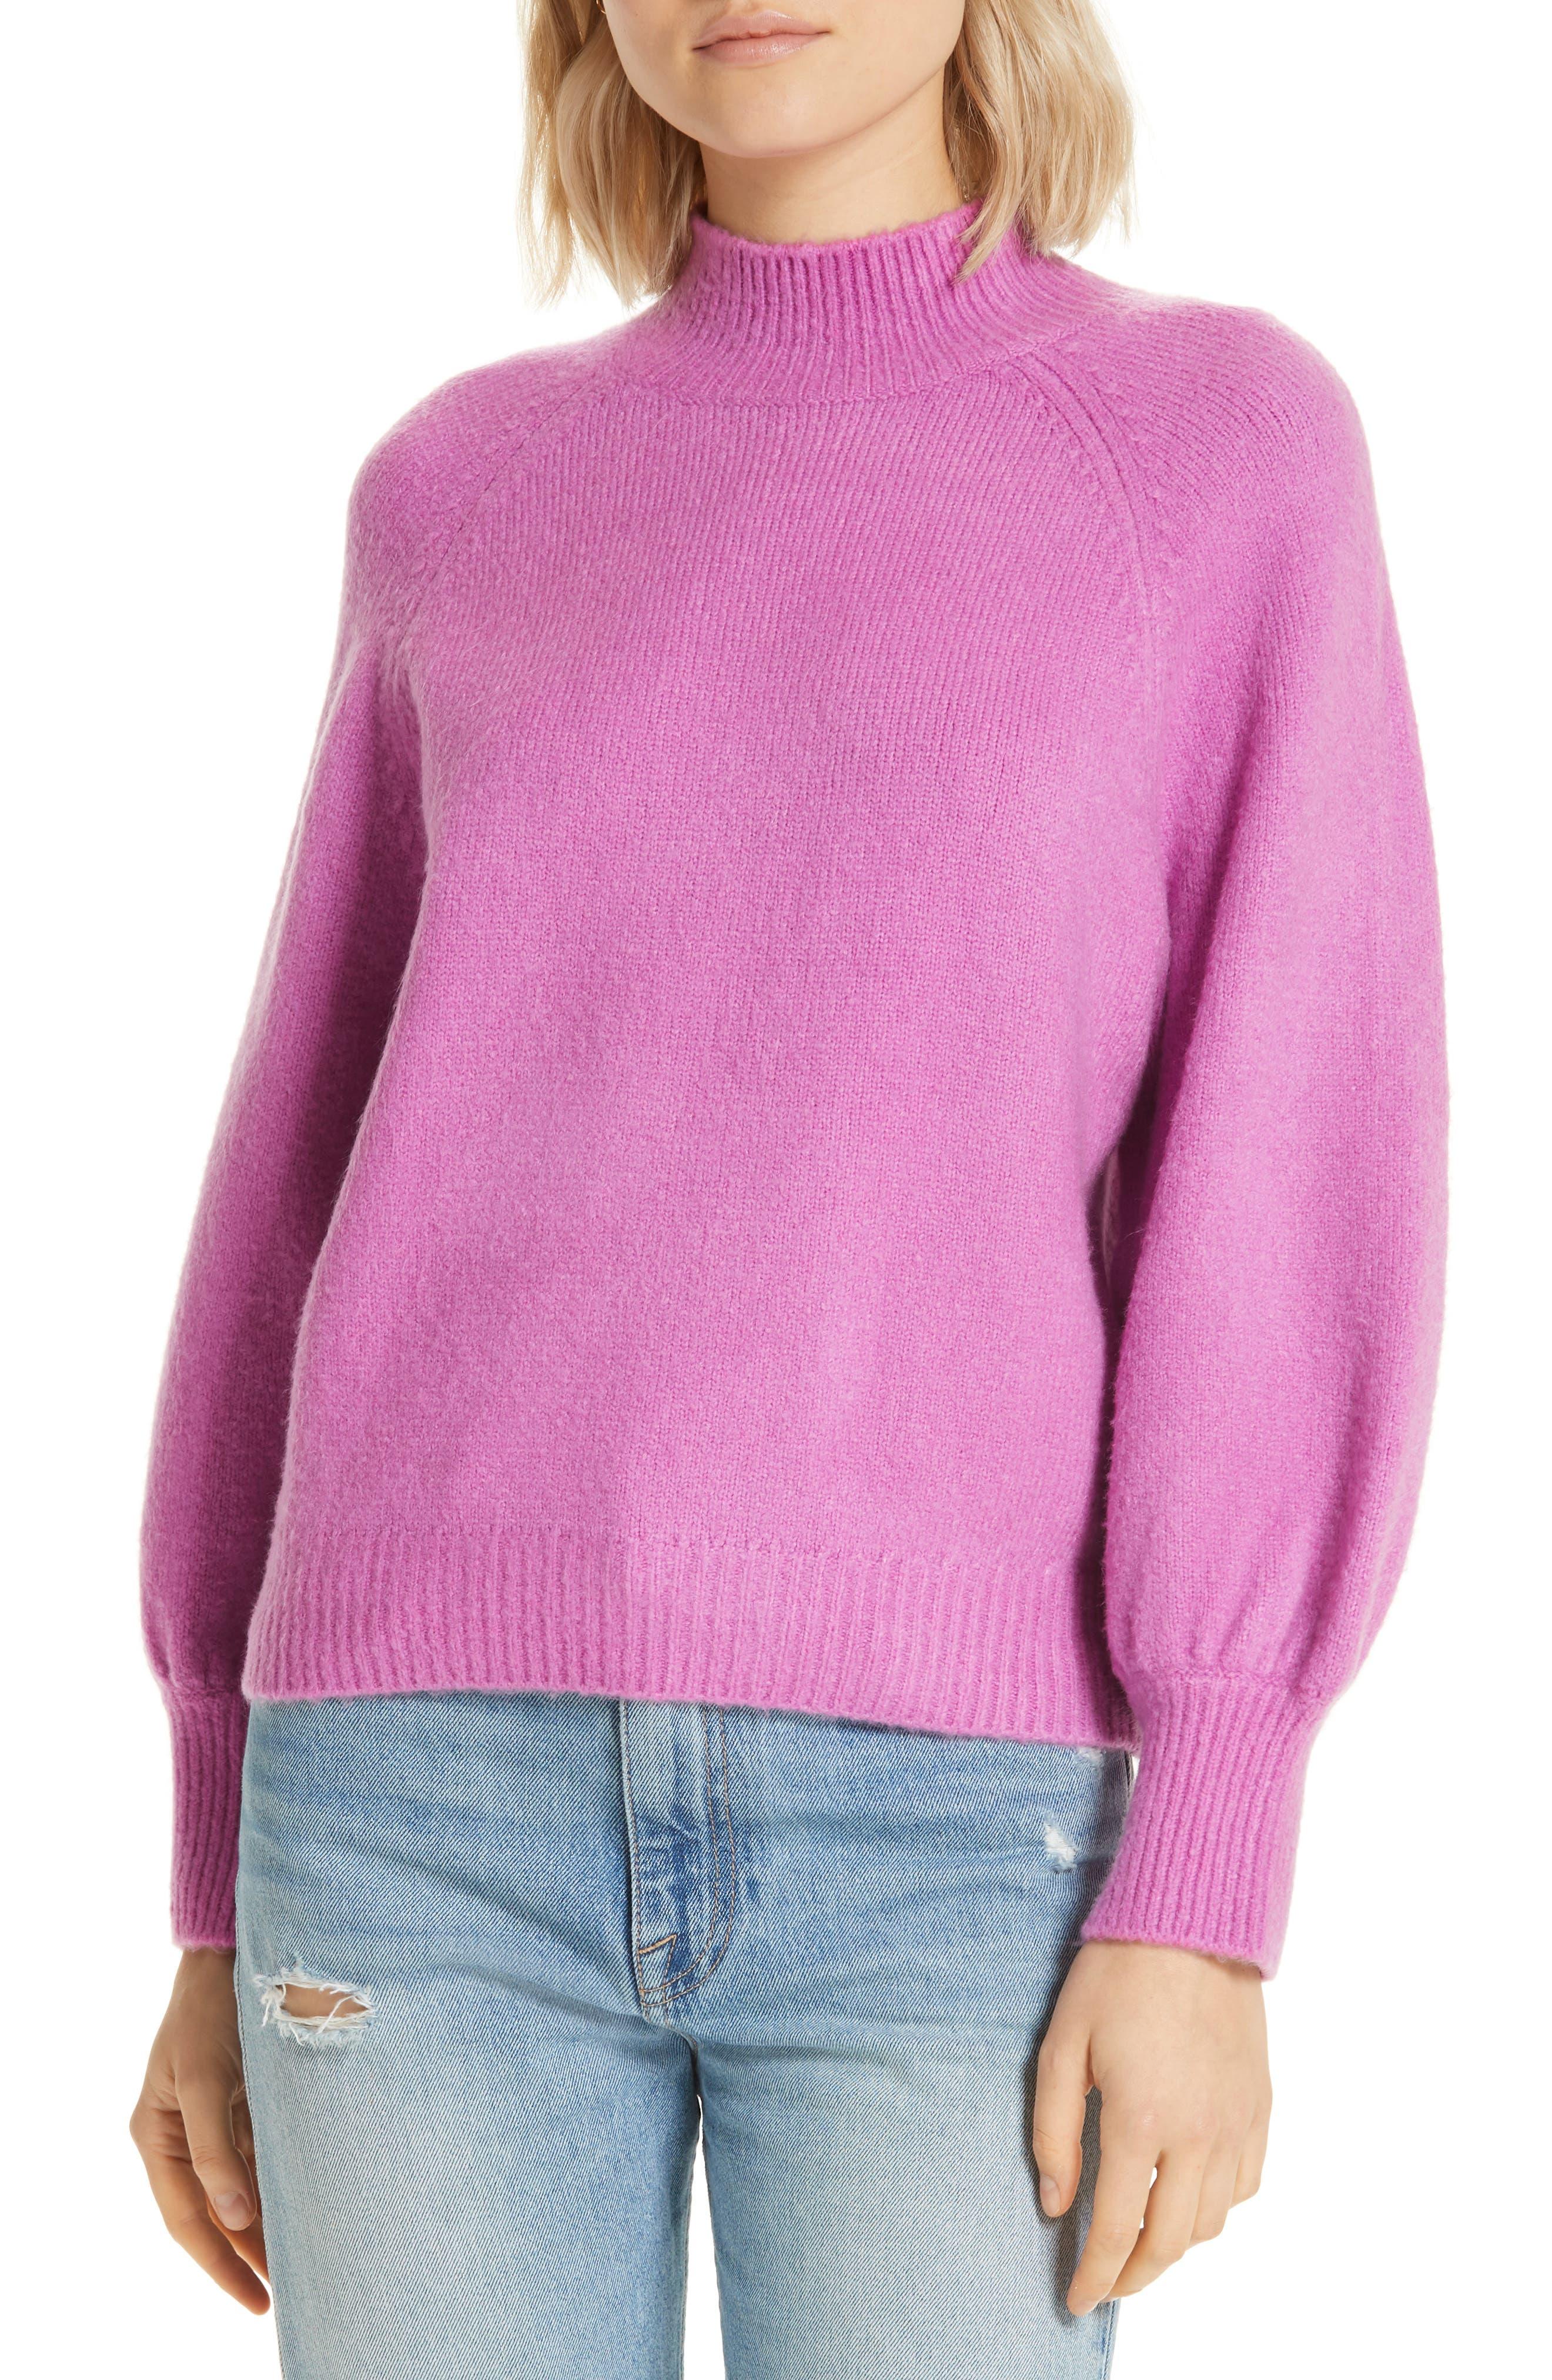 Jenlar Turtleneck Sweater,                             Main thumbnail 1, color,                             650